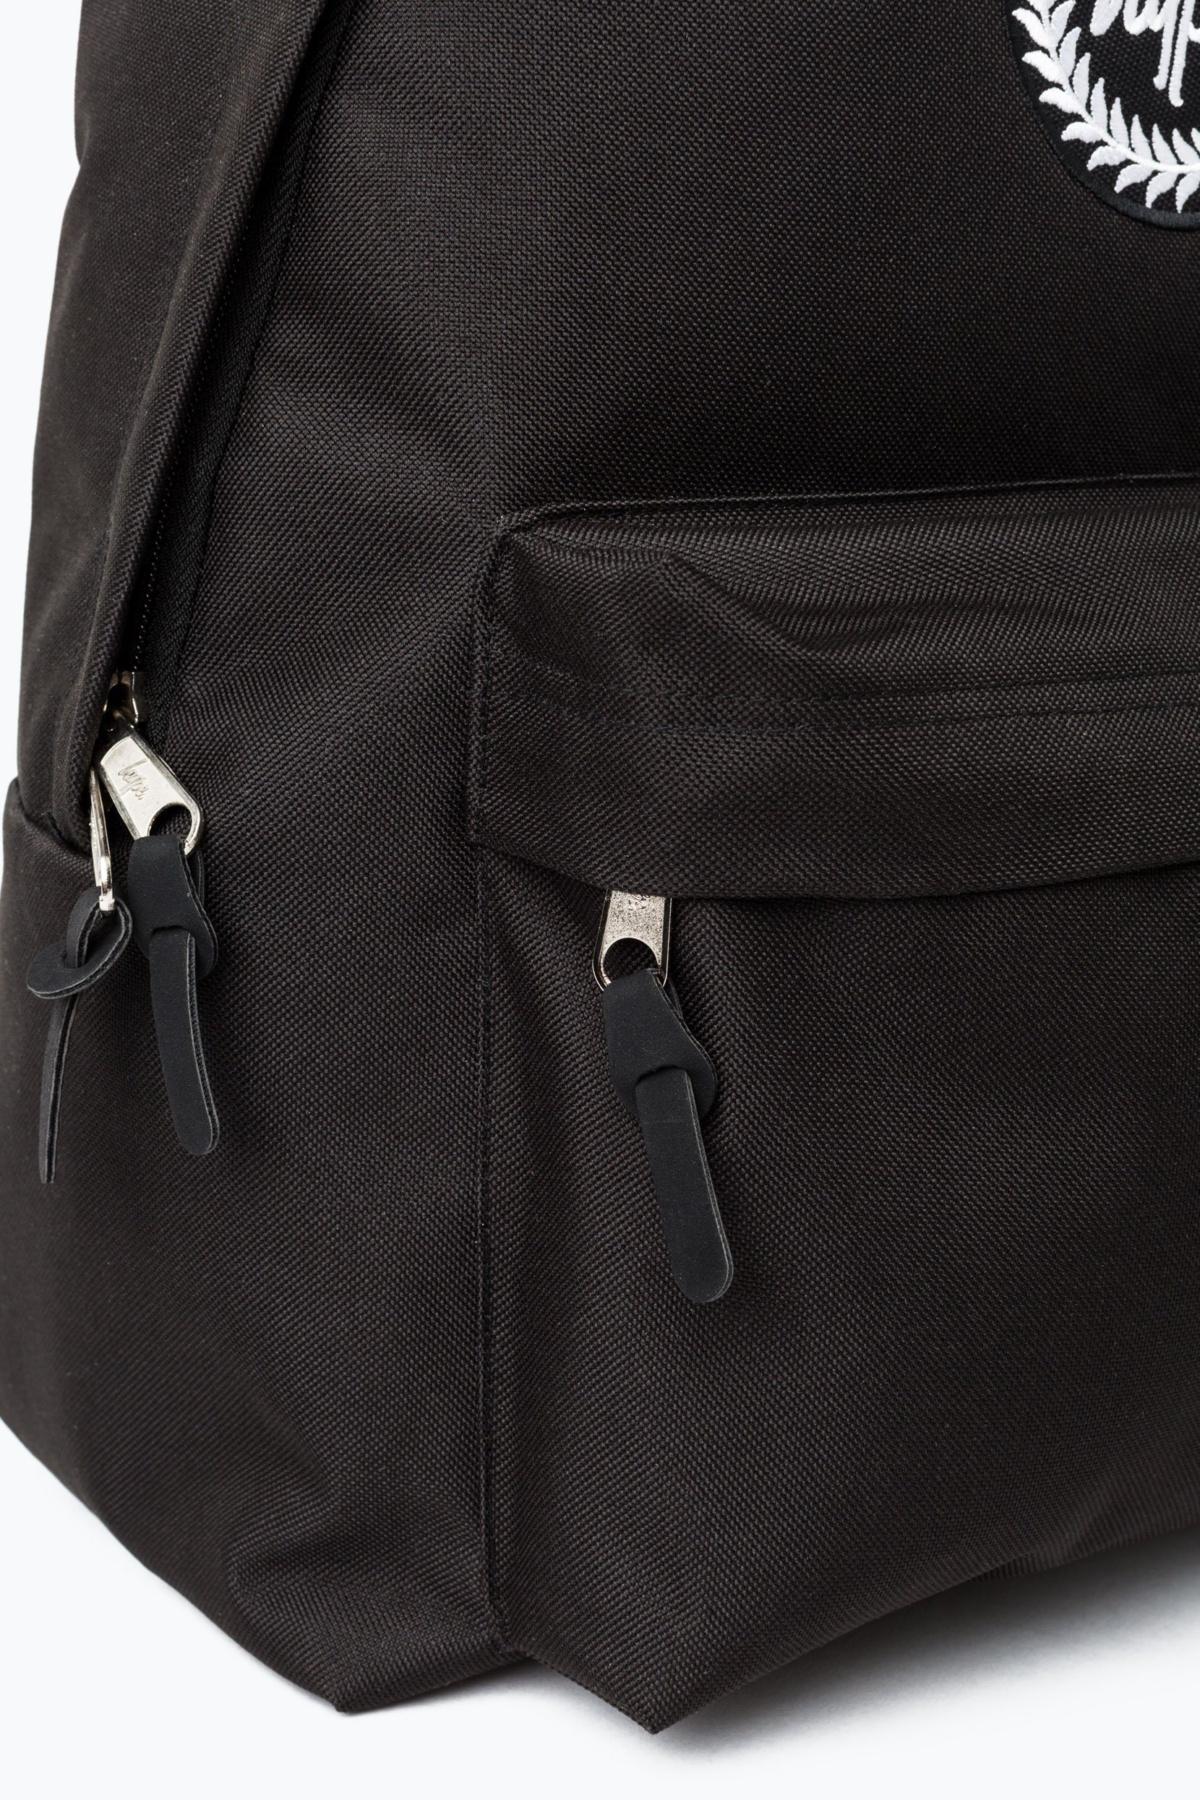 HYPE Black Strap Tape Backpack